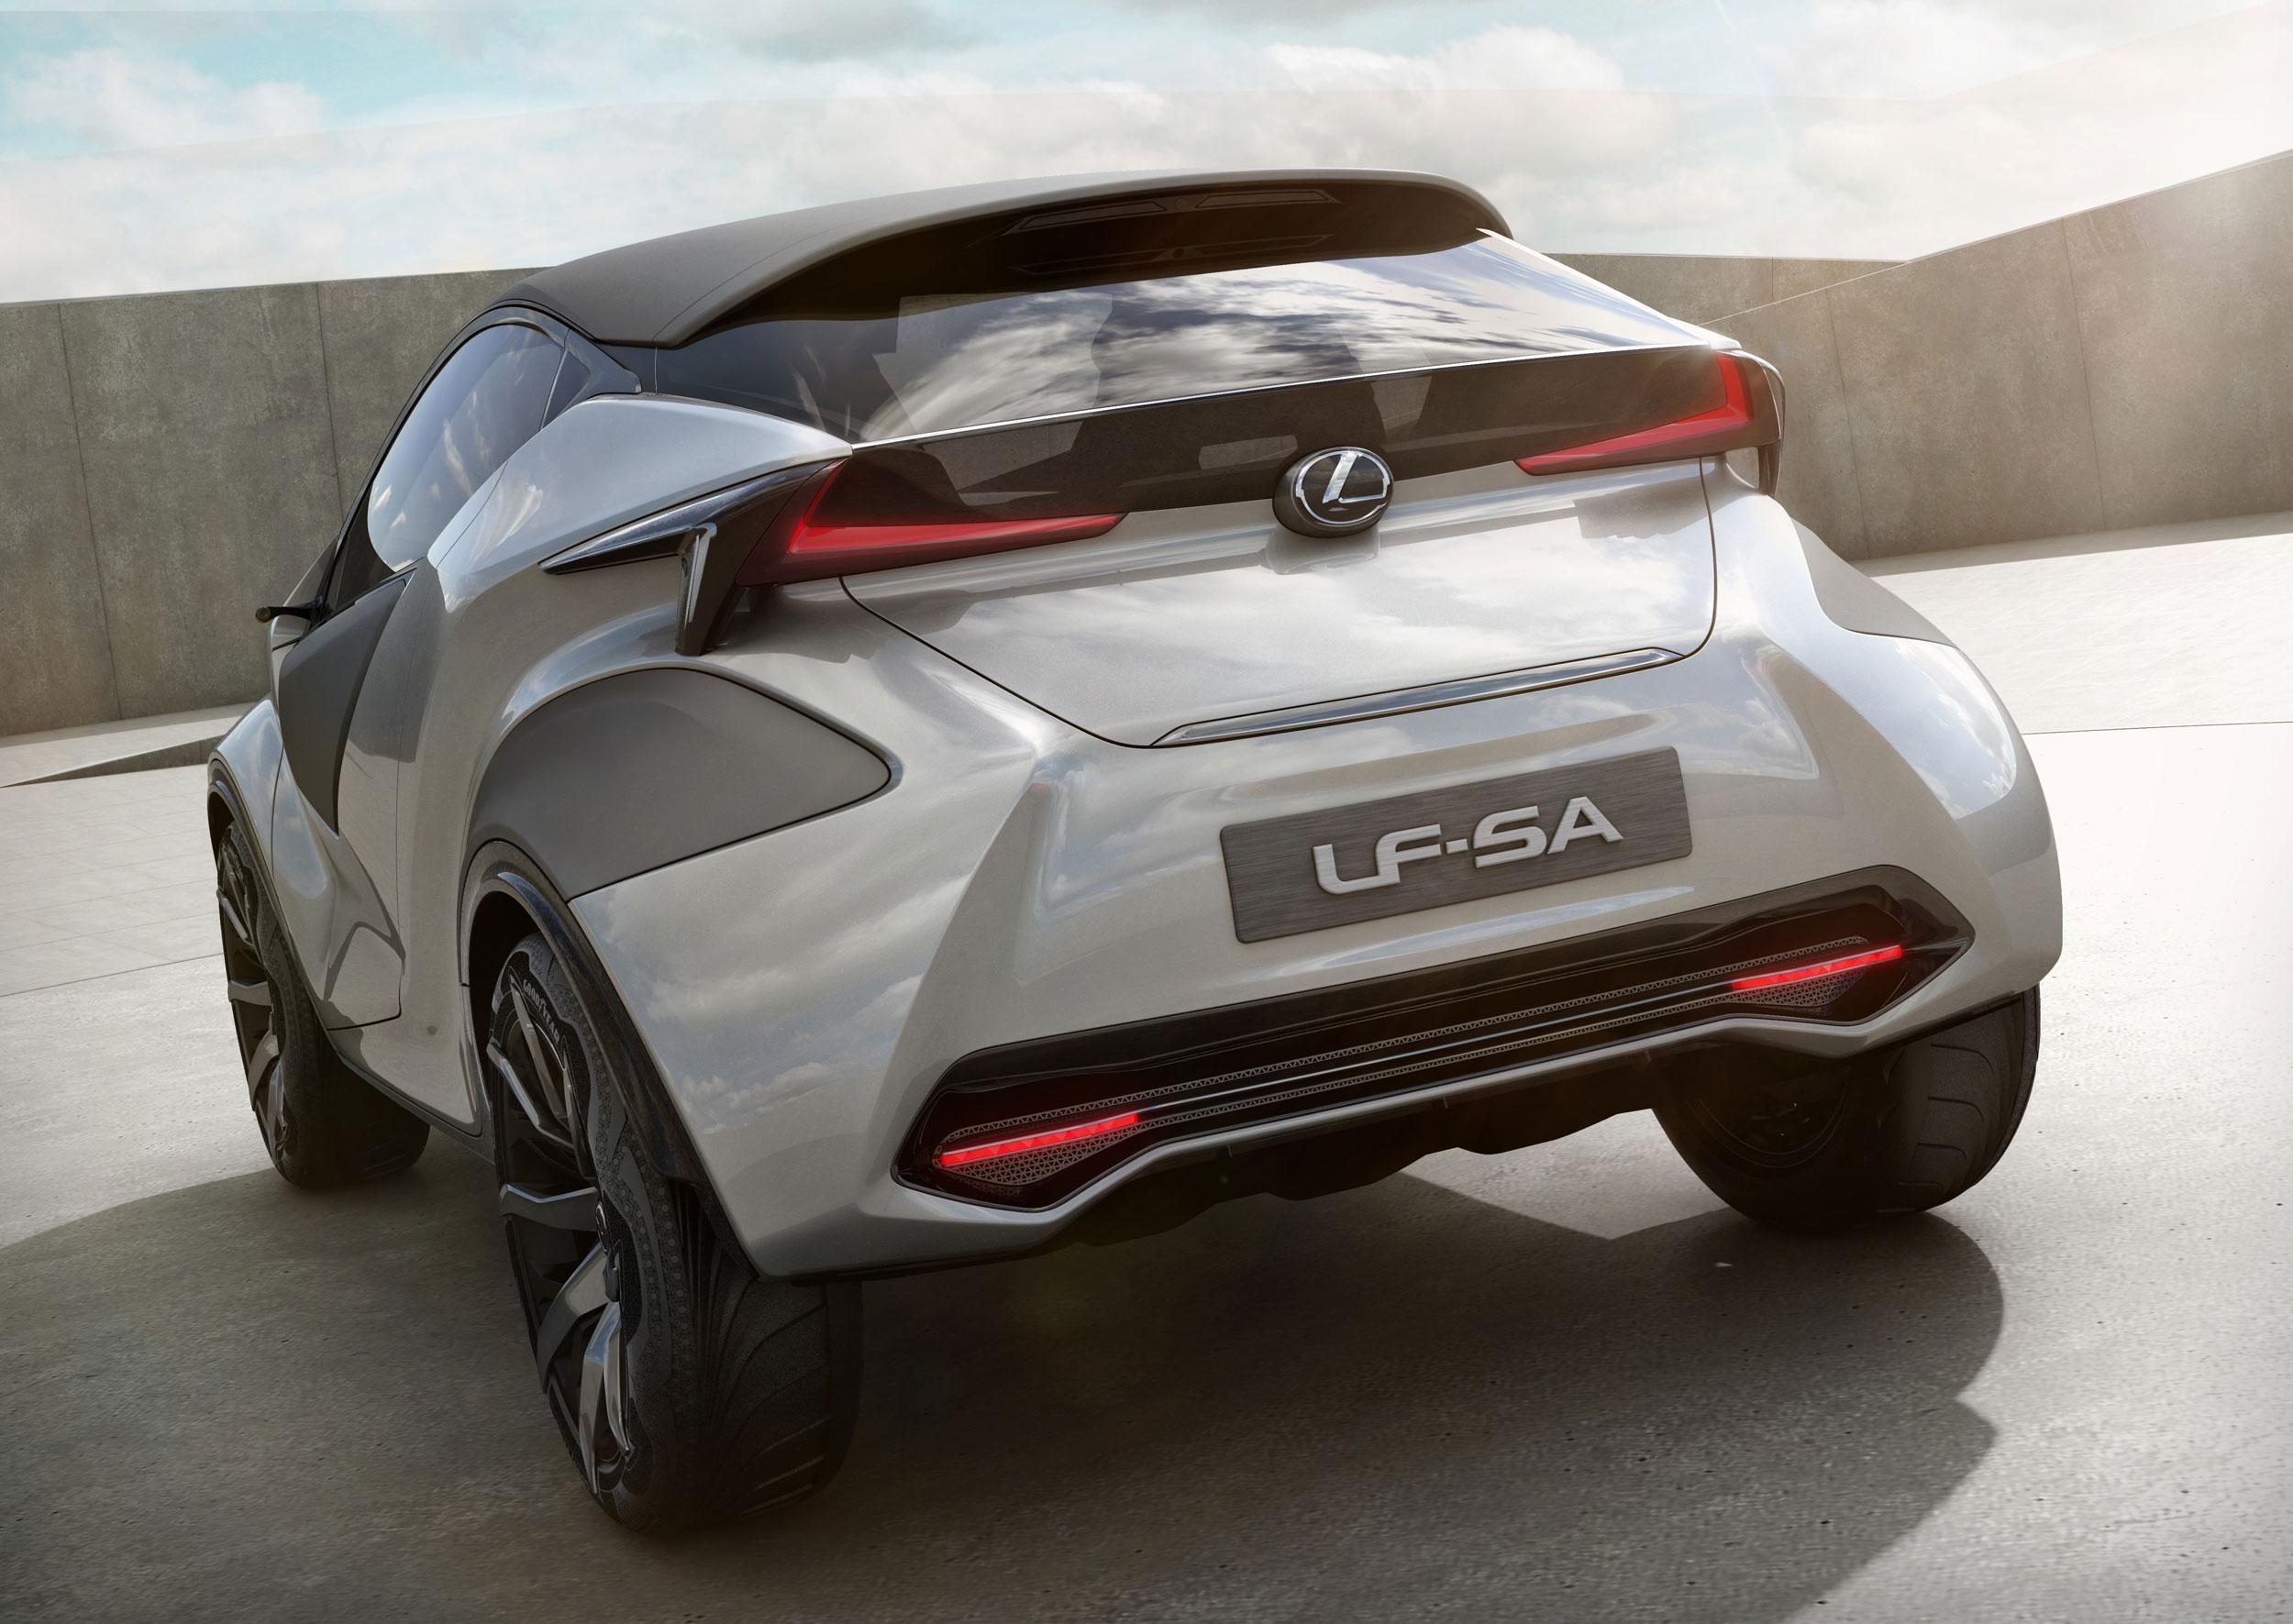 Lexus LF-SA Rear